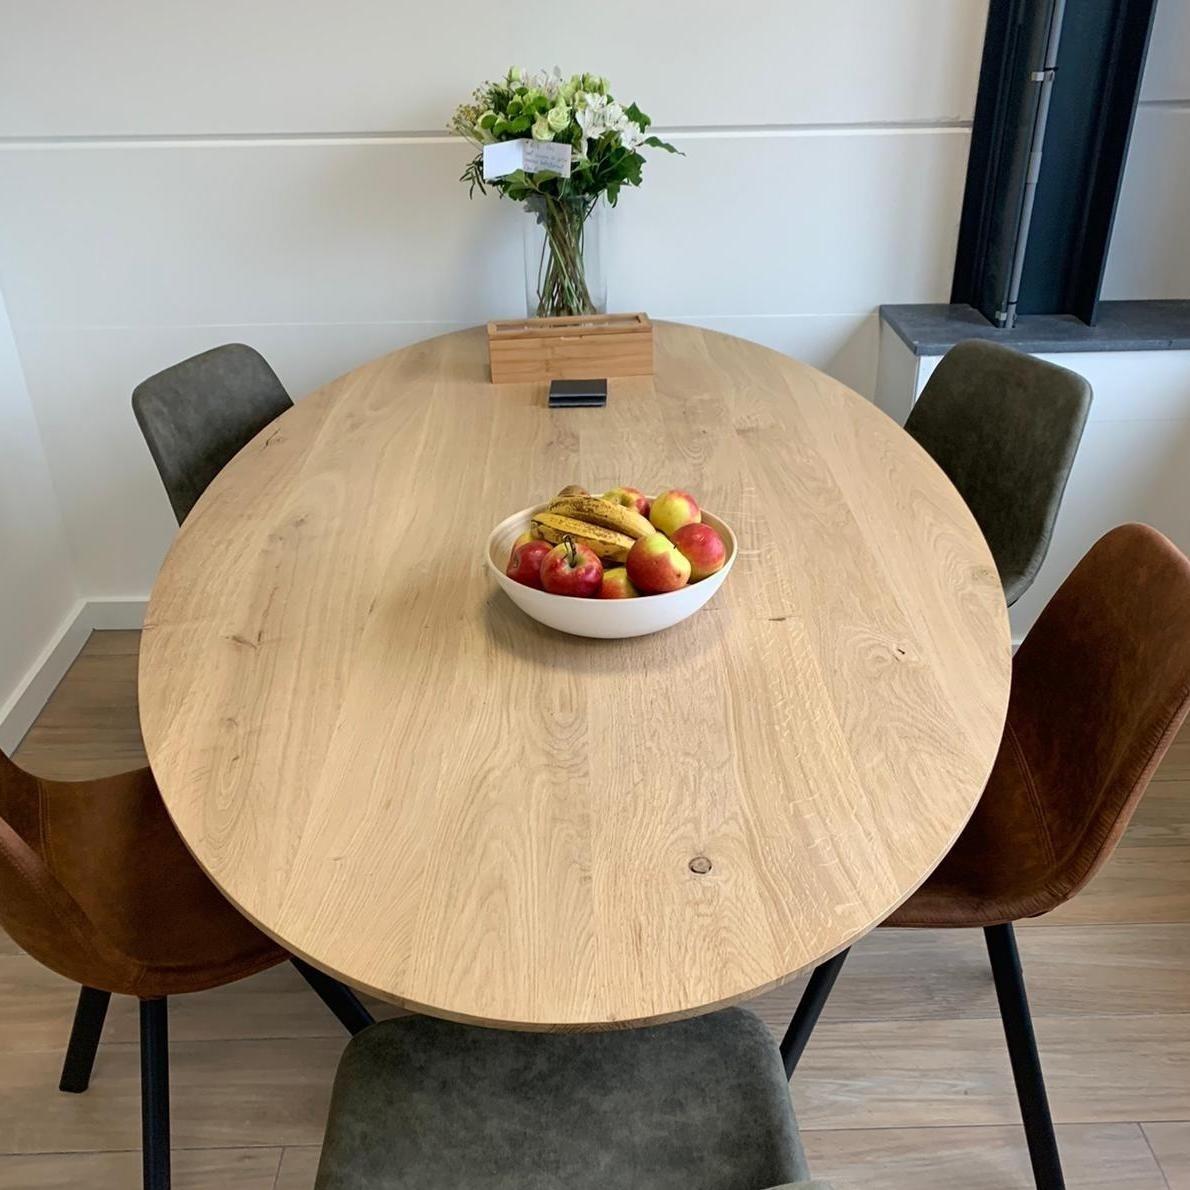 Eiken tafelblad ovaal -  4,5 cm dik (1-laag) - extra rustiek Europees eikenhout GEBORSTELD - verlijmd kd 10-12%